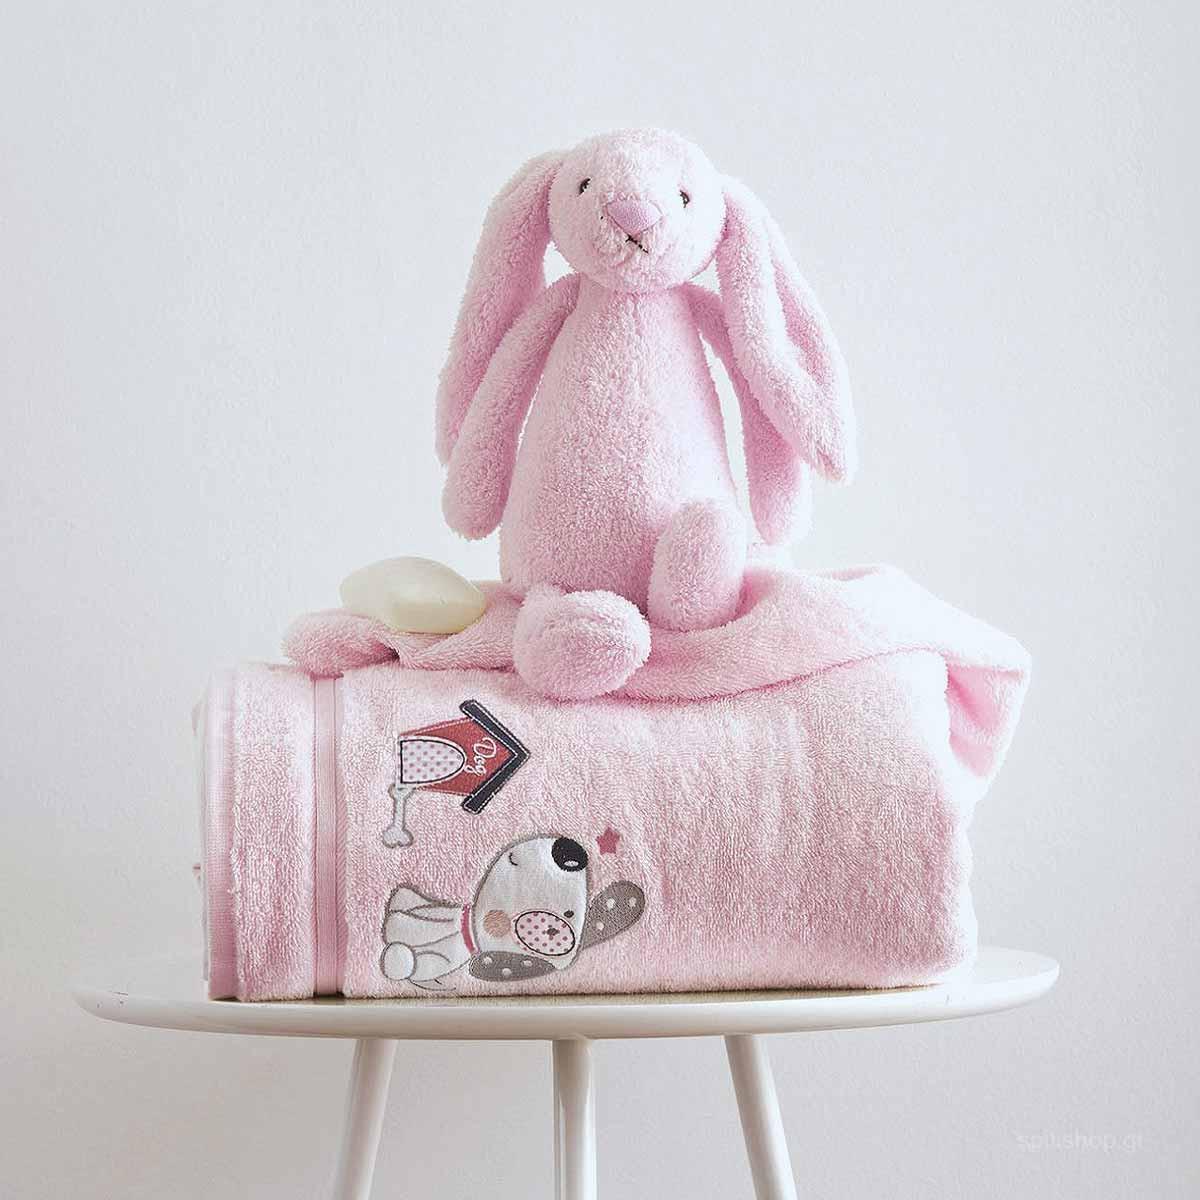 58f54fb3c16 ... Βρεφικές Πετσέτες (Σετ 2τμχ) Sb Home Baby Puppy Pink